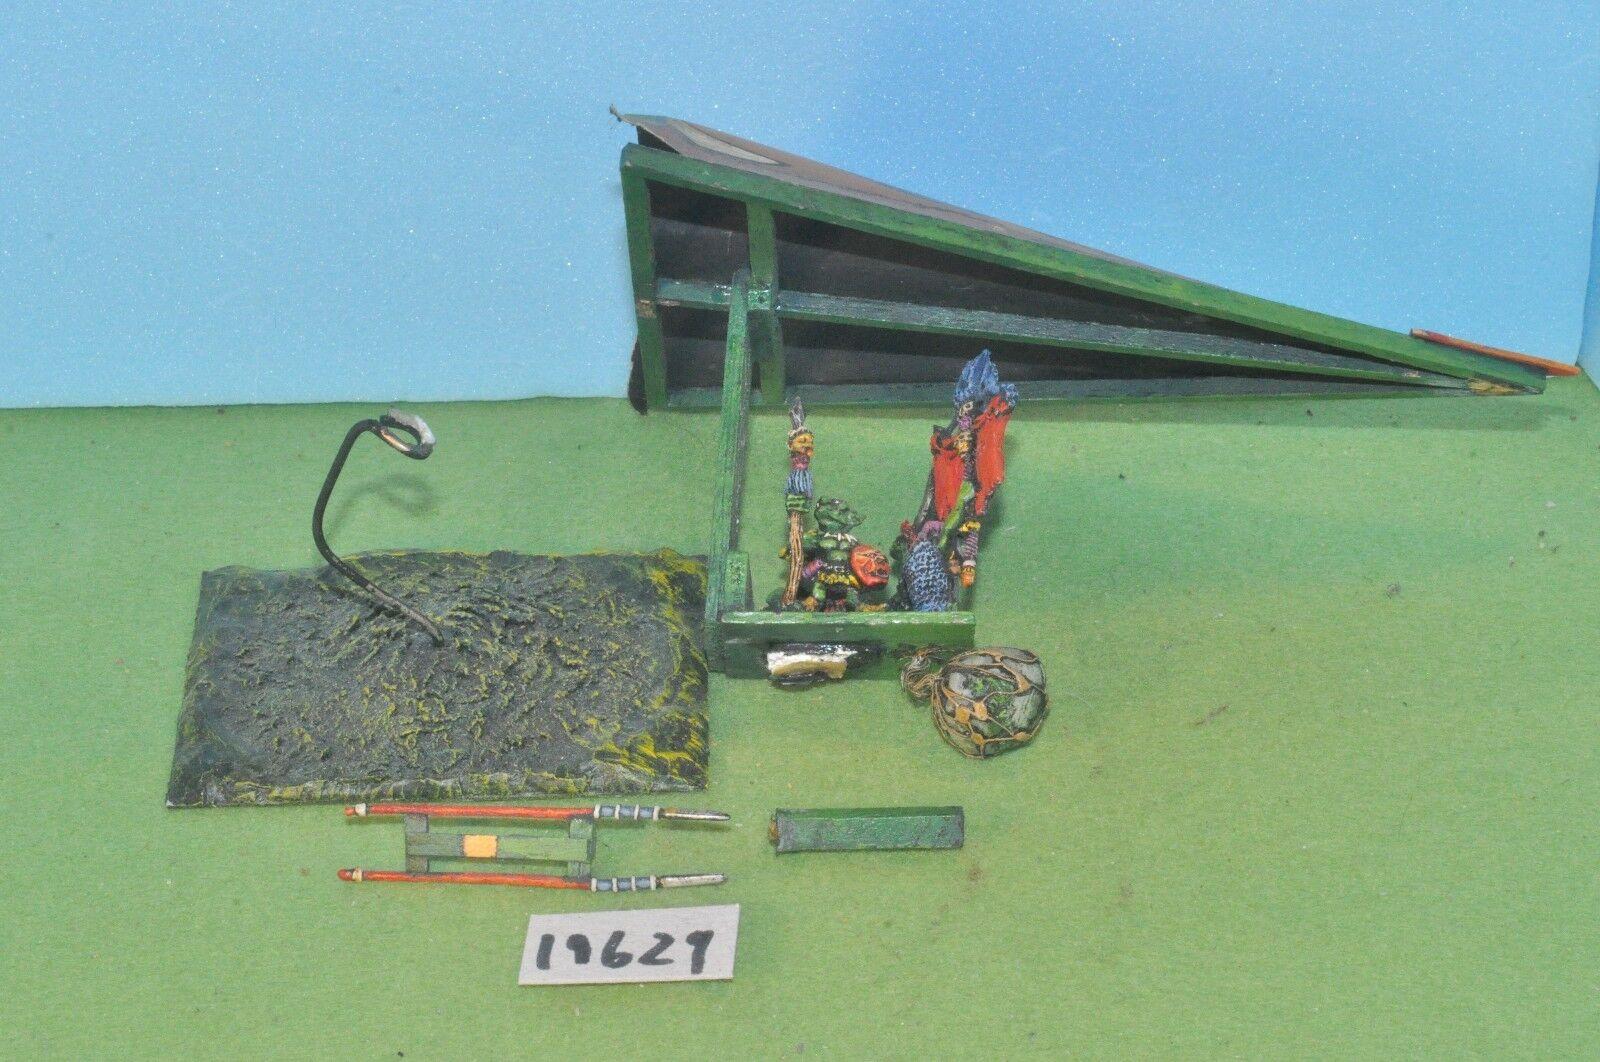 Sigmar goblin glider bomber plastic   wood ral partha citadel rare oop (19629)